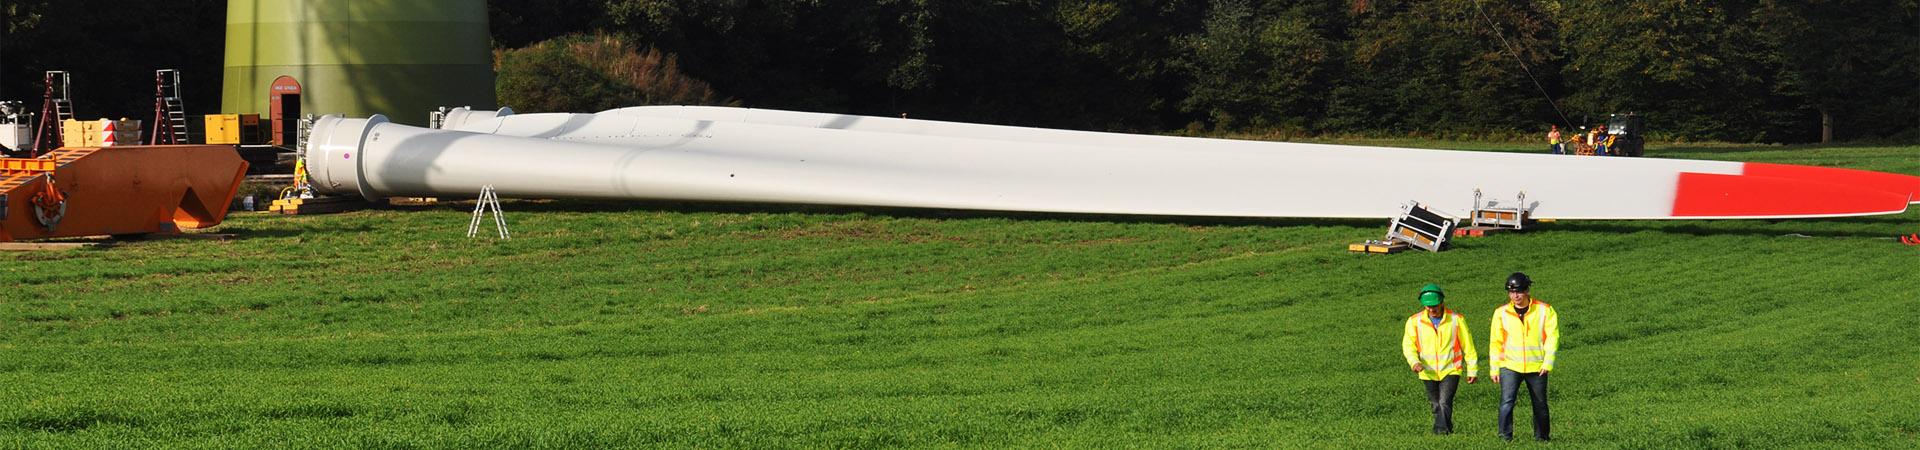 aufbau-windenergieanlage-techniker-sl-naturenergie